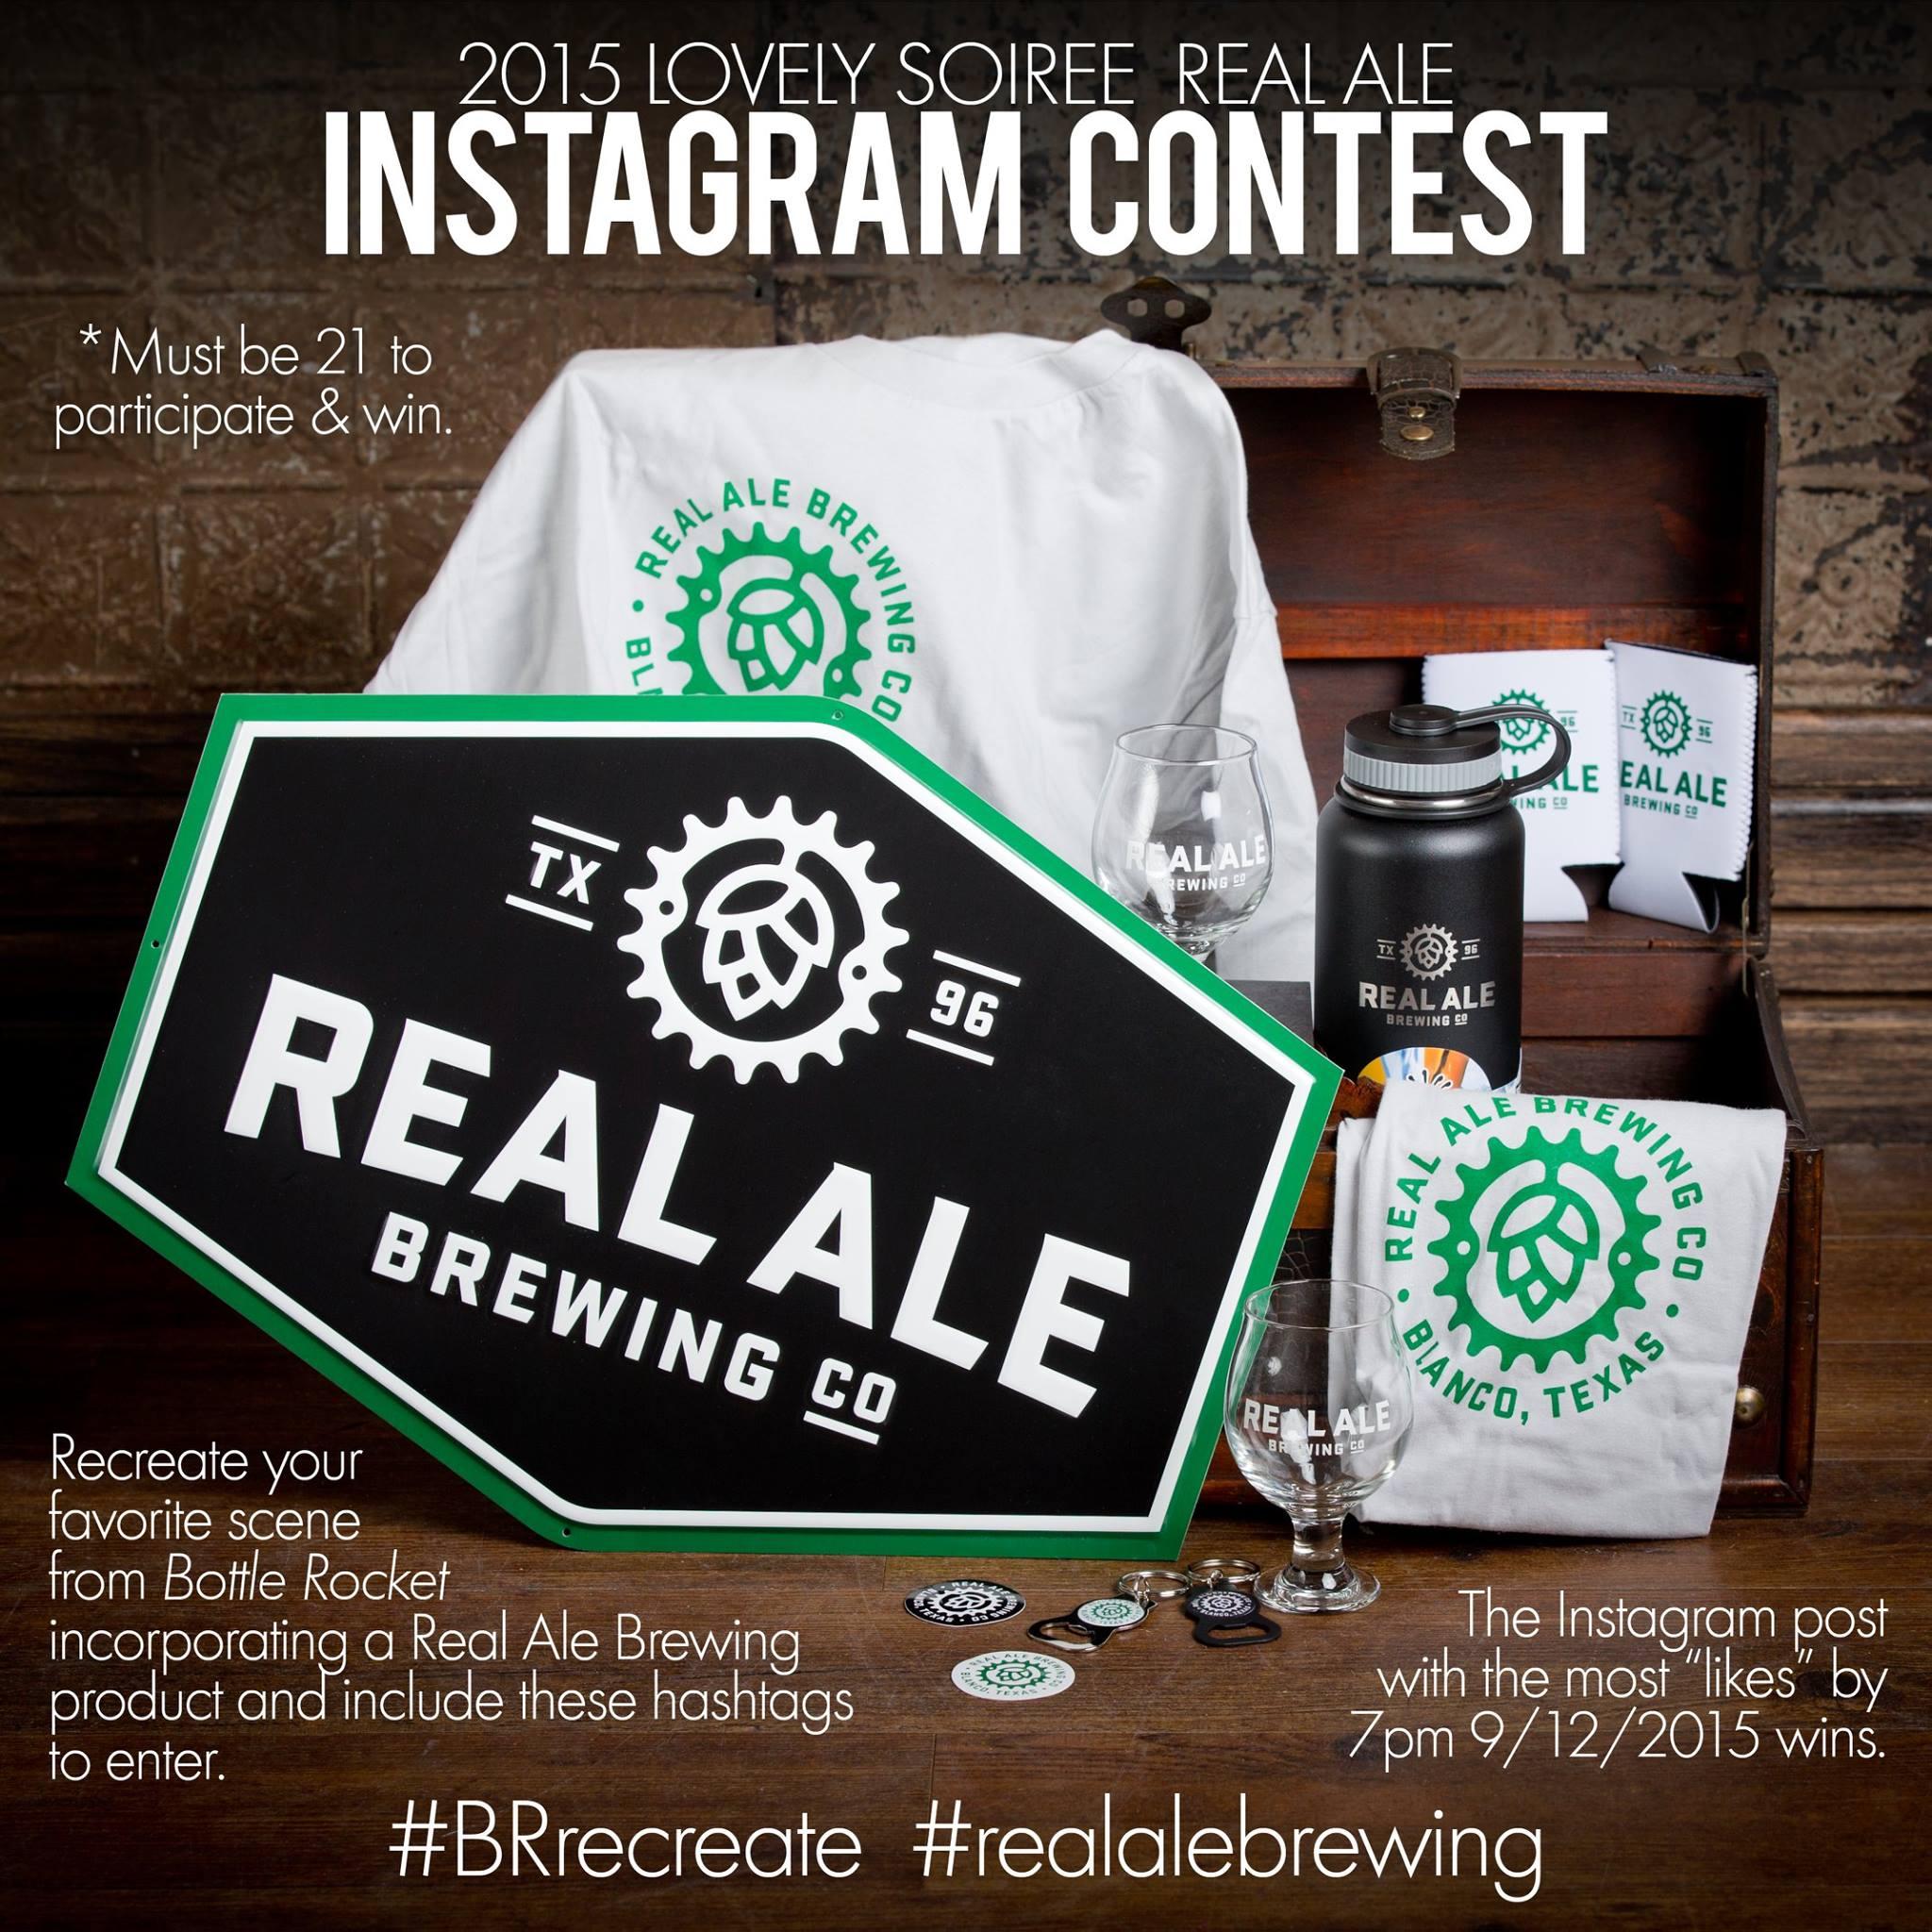 Real Ale Brewing Co.Prize Pack for Intsagram Contest - Winner Matt Reuber